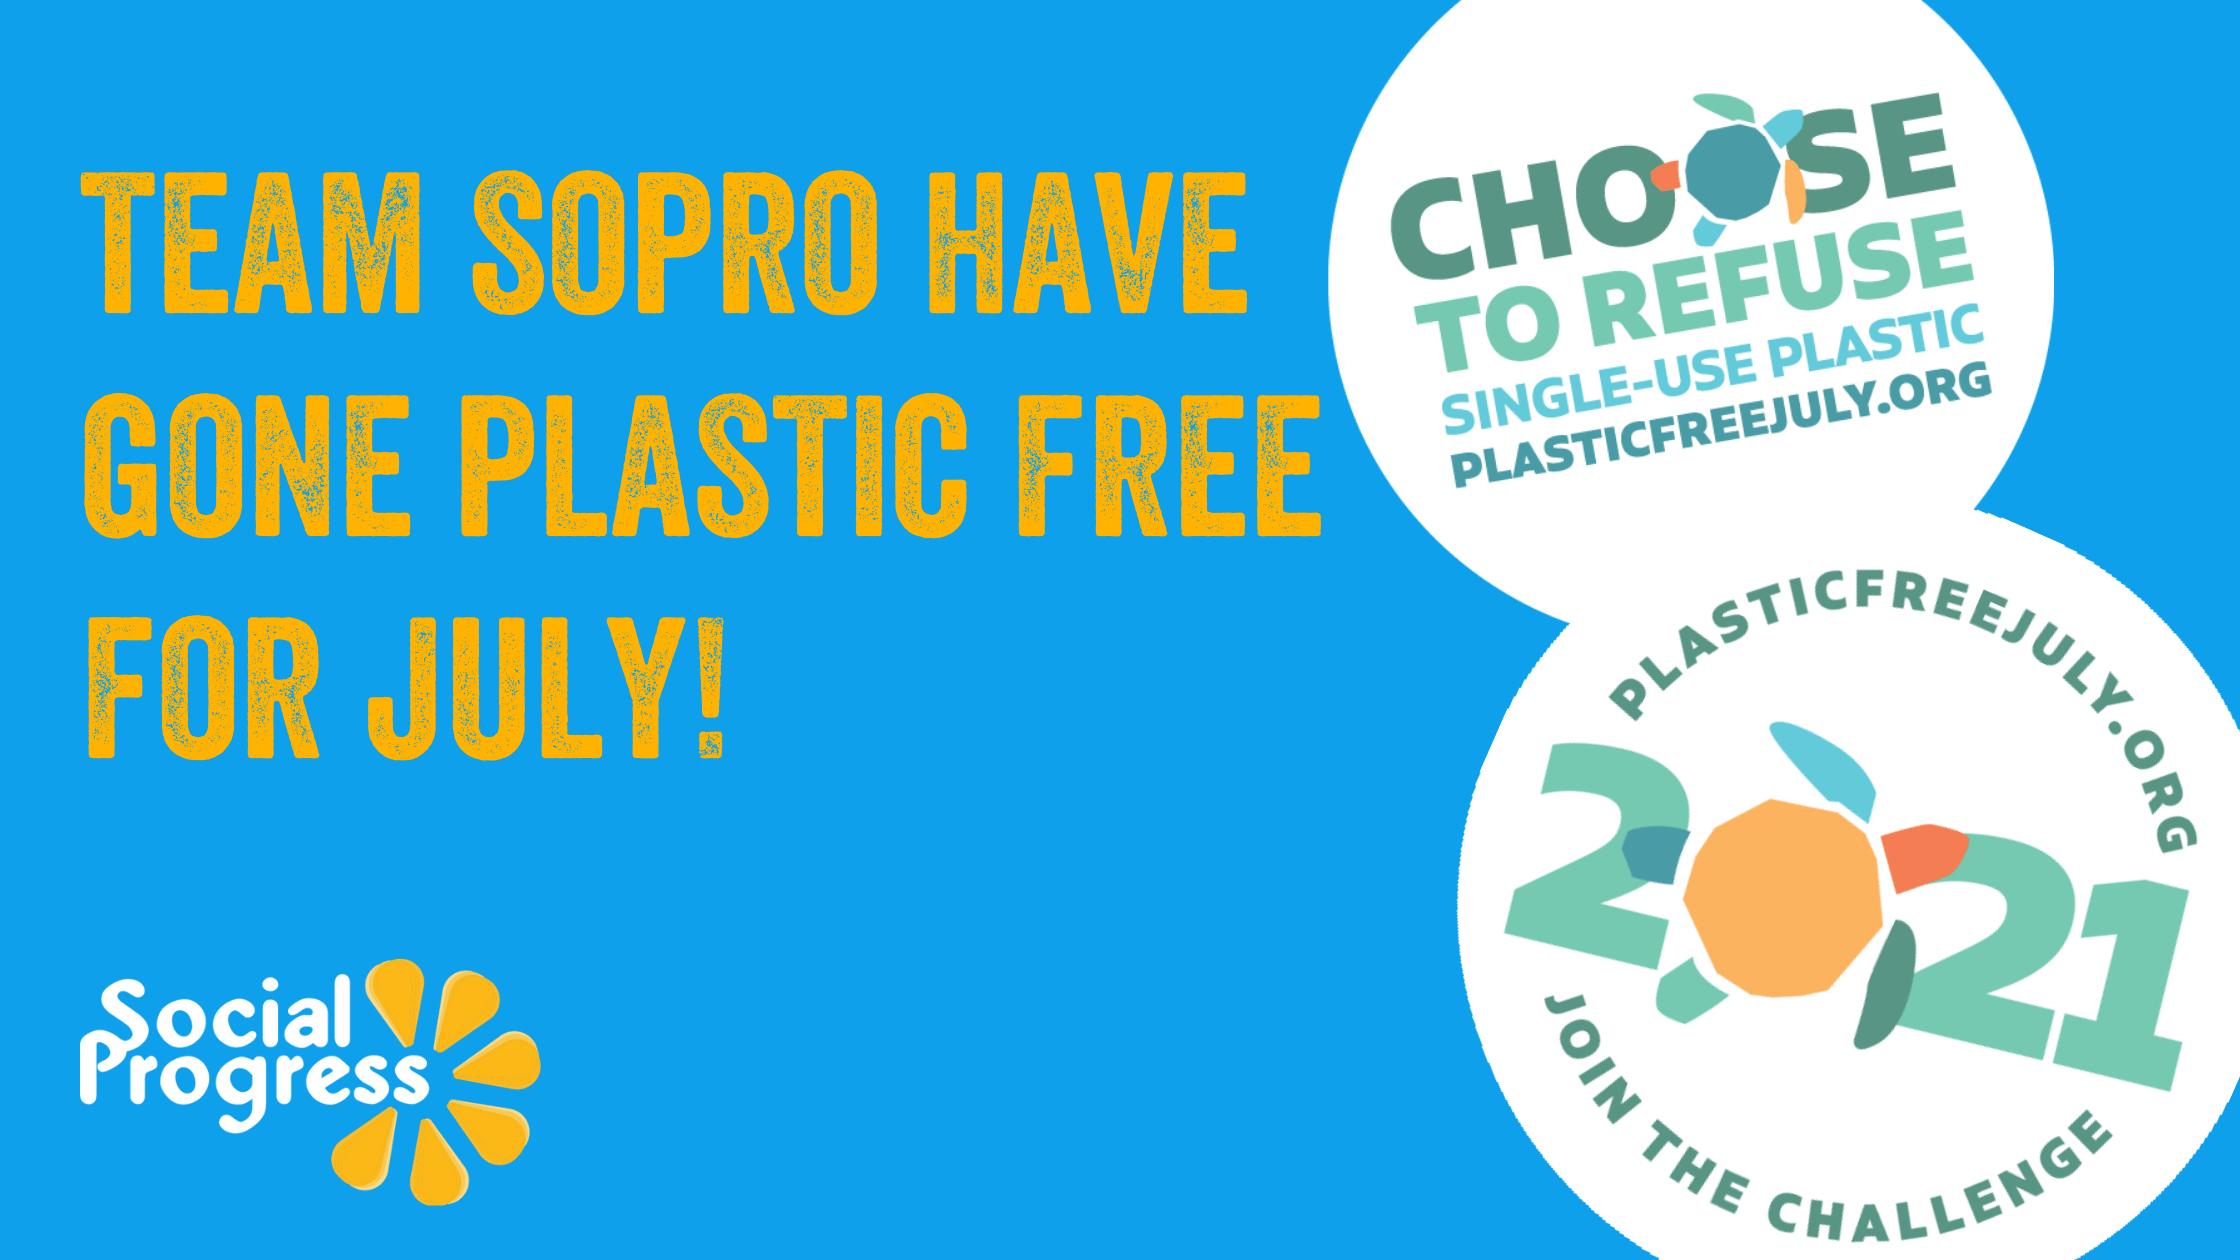 20210722 – Plastic free july image